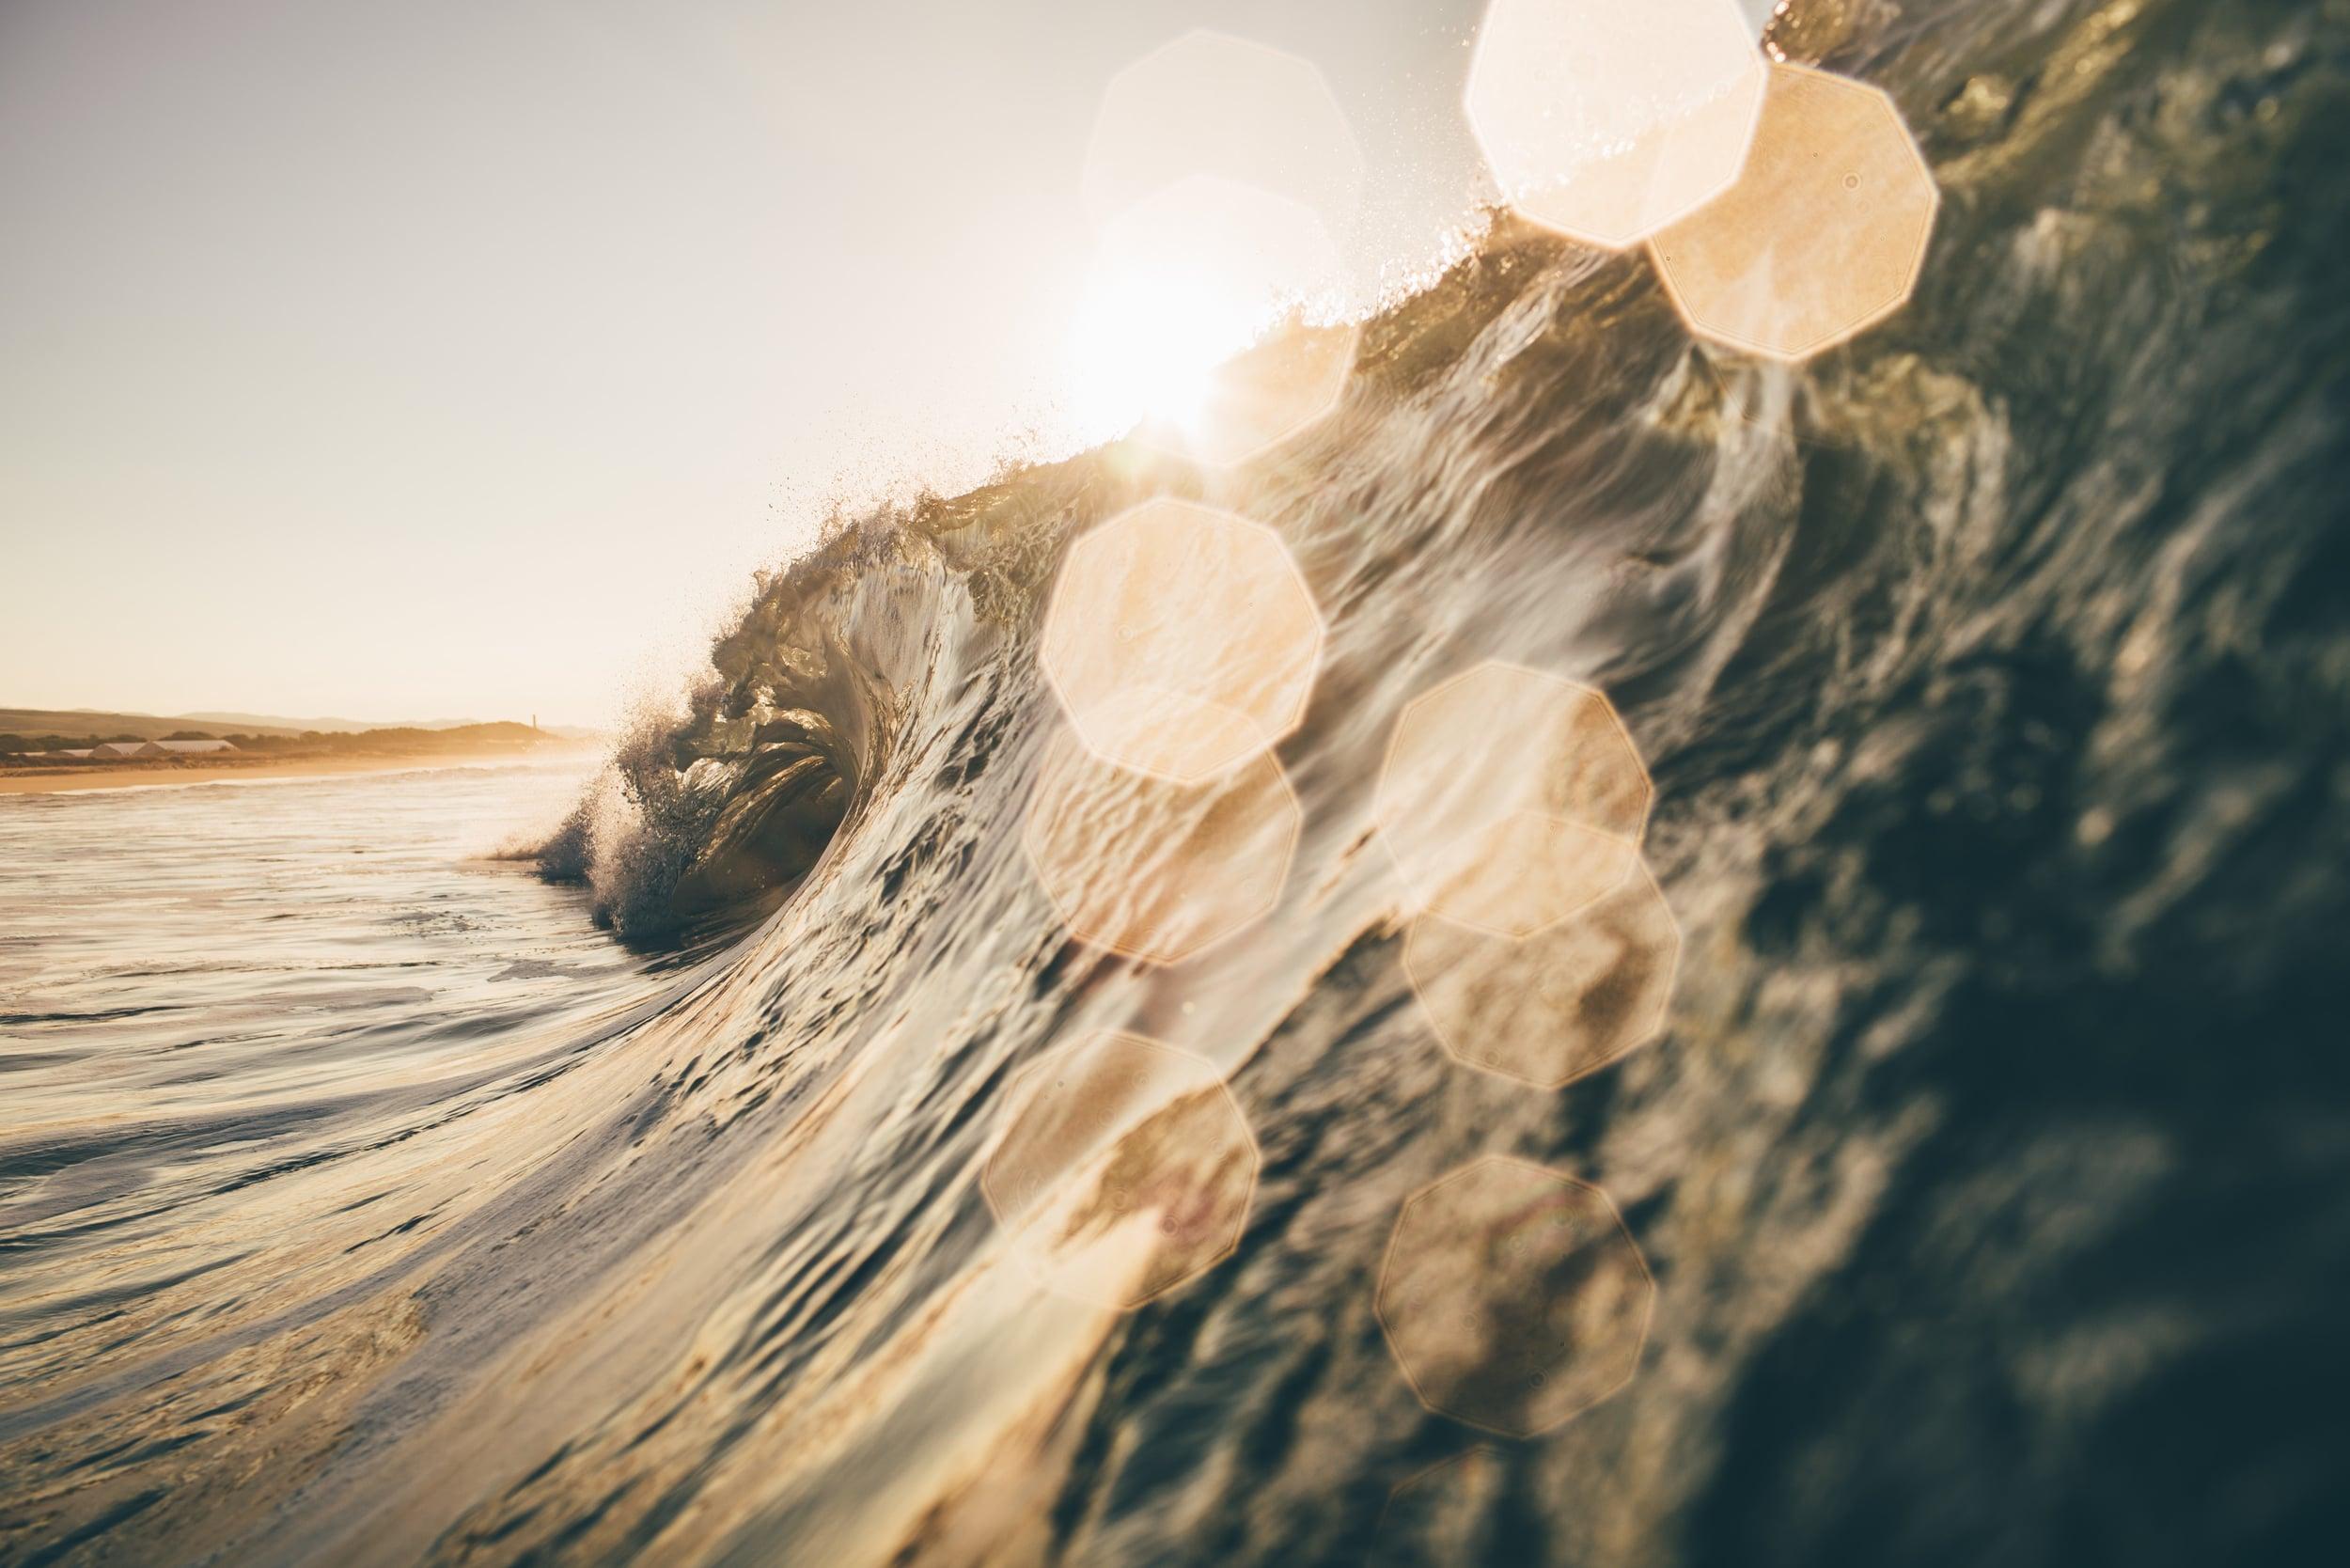 bryce-johnson-photography-kauai-hawaii-surfing-a7rii-aquatech-water-ocean-23.jpg